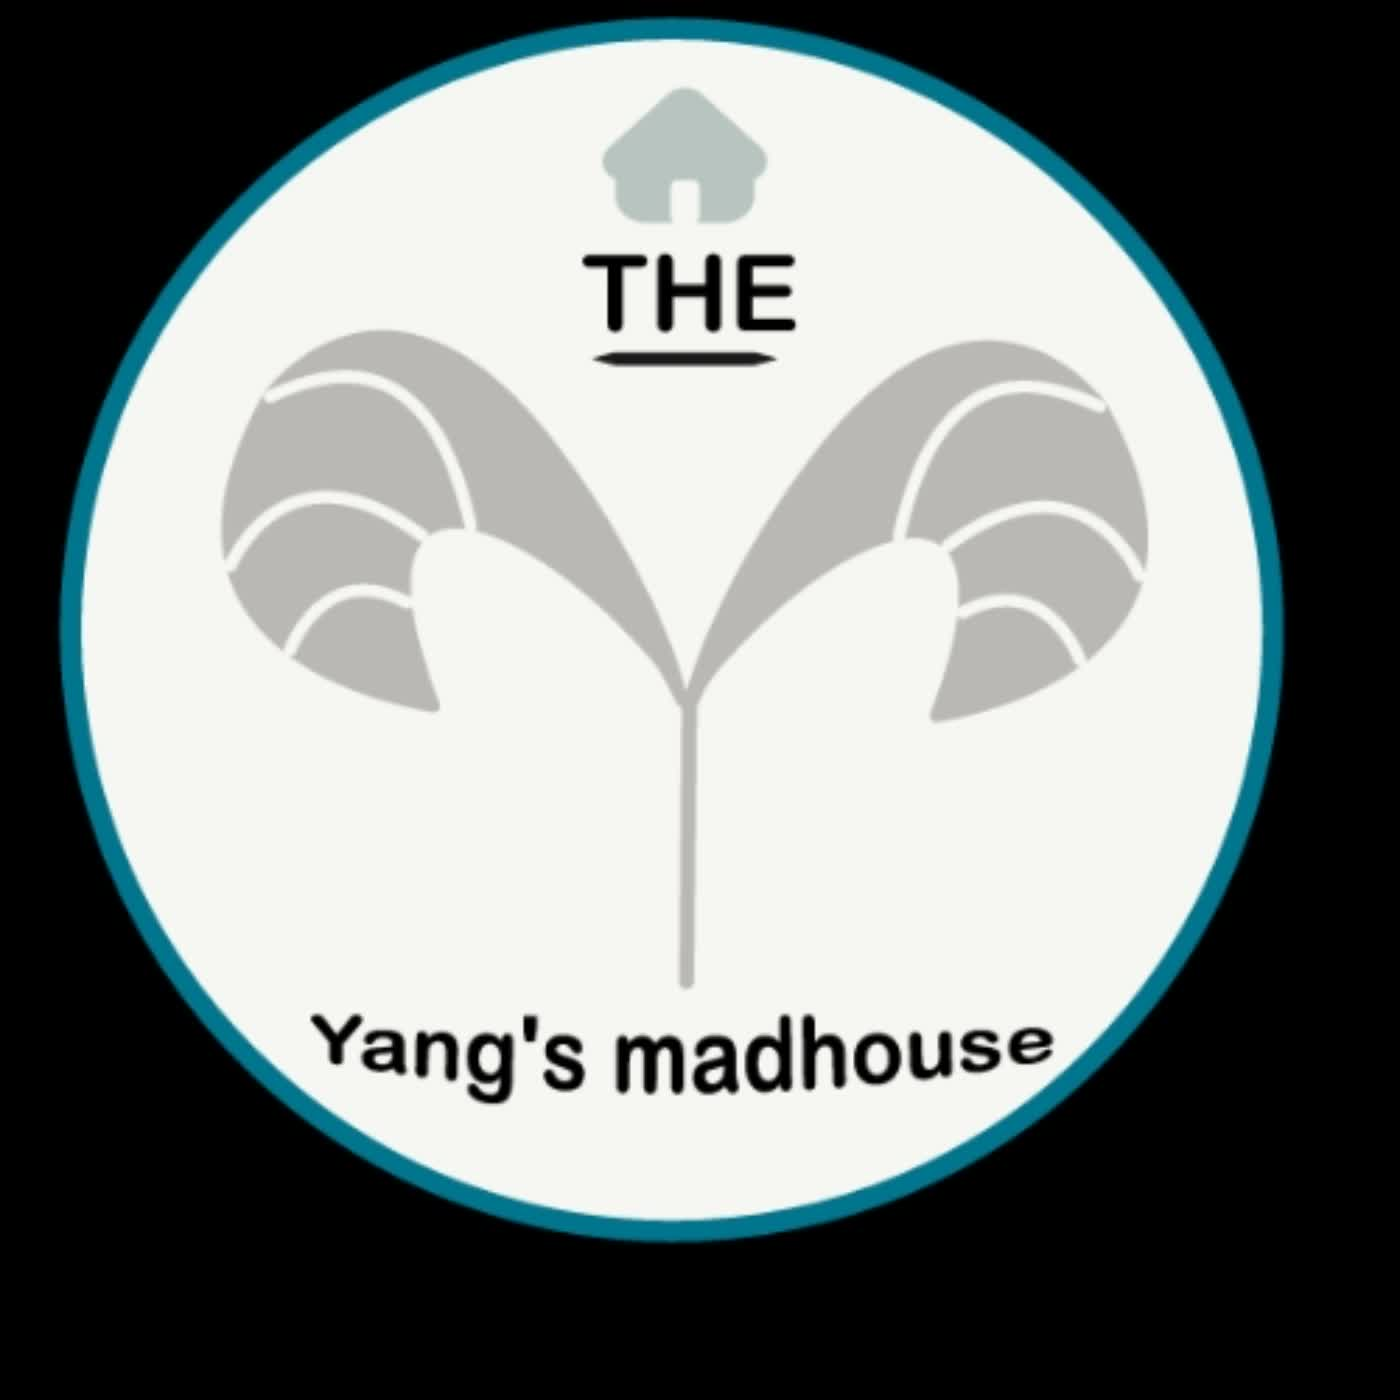 The Yang's madhouse一楊氏瘋人院